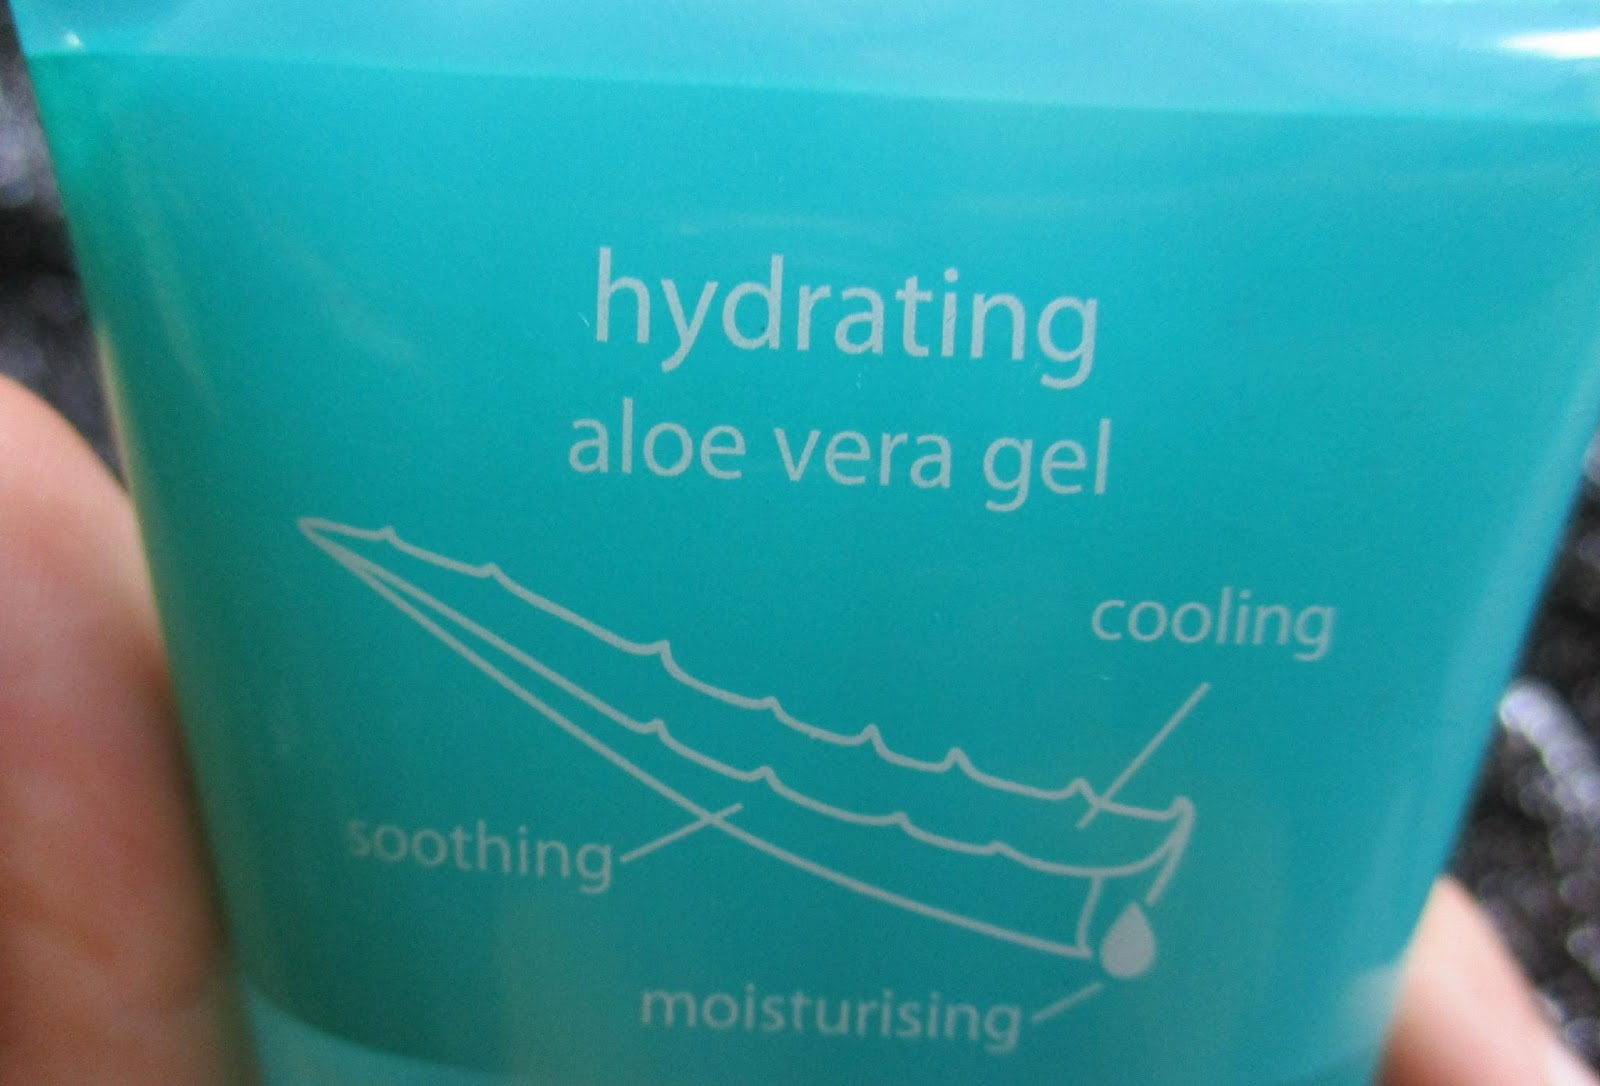 Ranis Latter Wardah Hydrating Aloe Vera Gel REVIEW